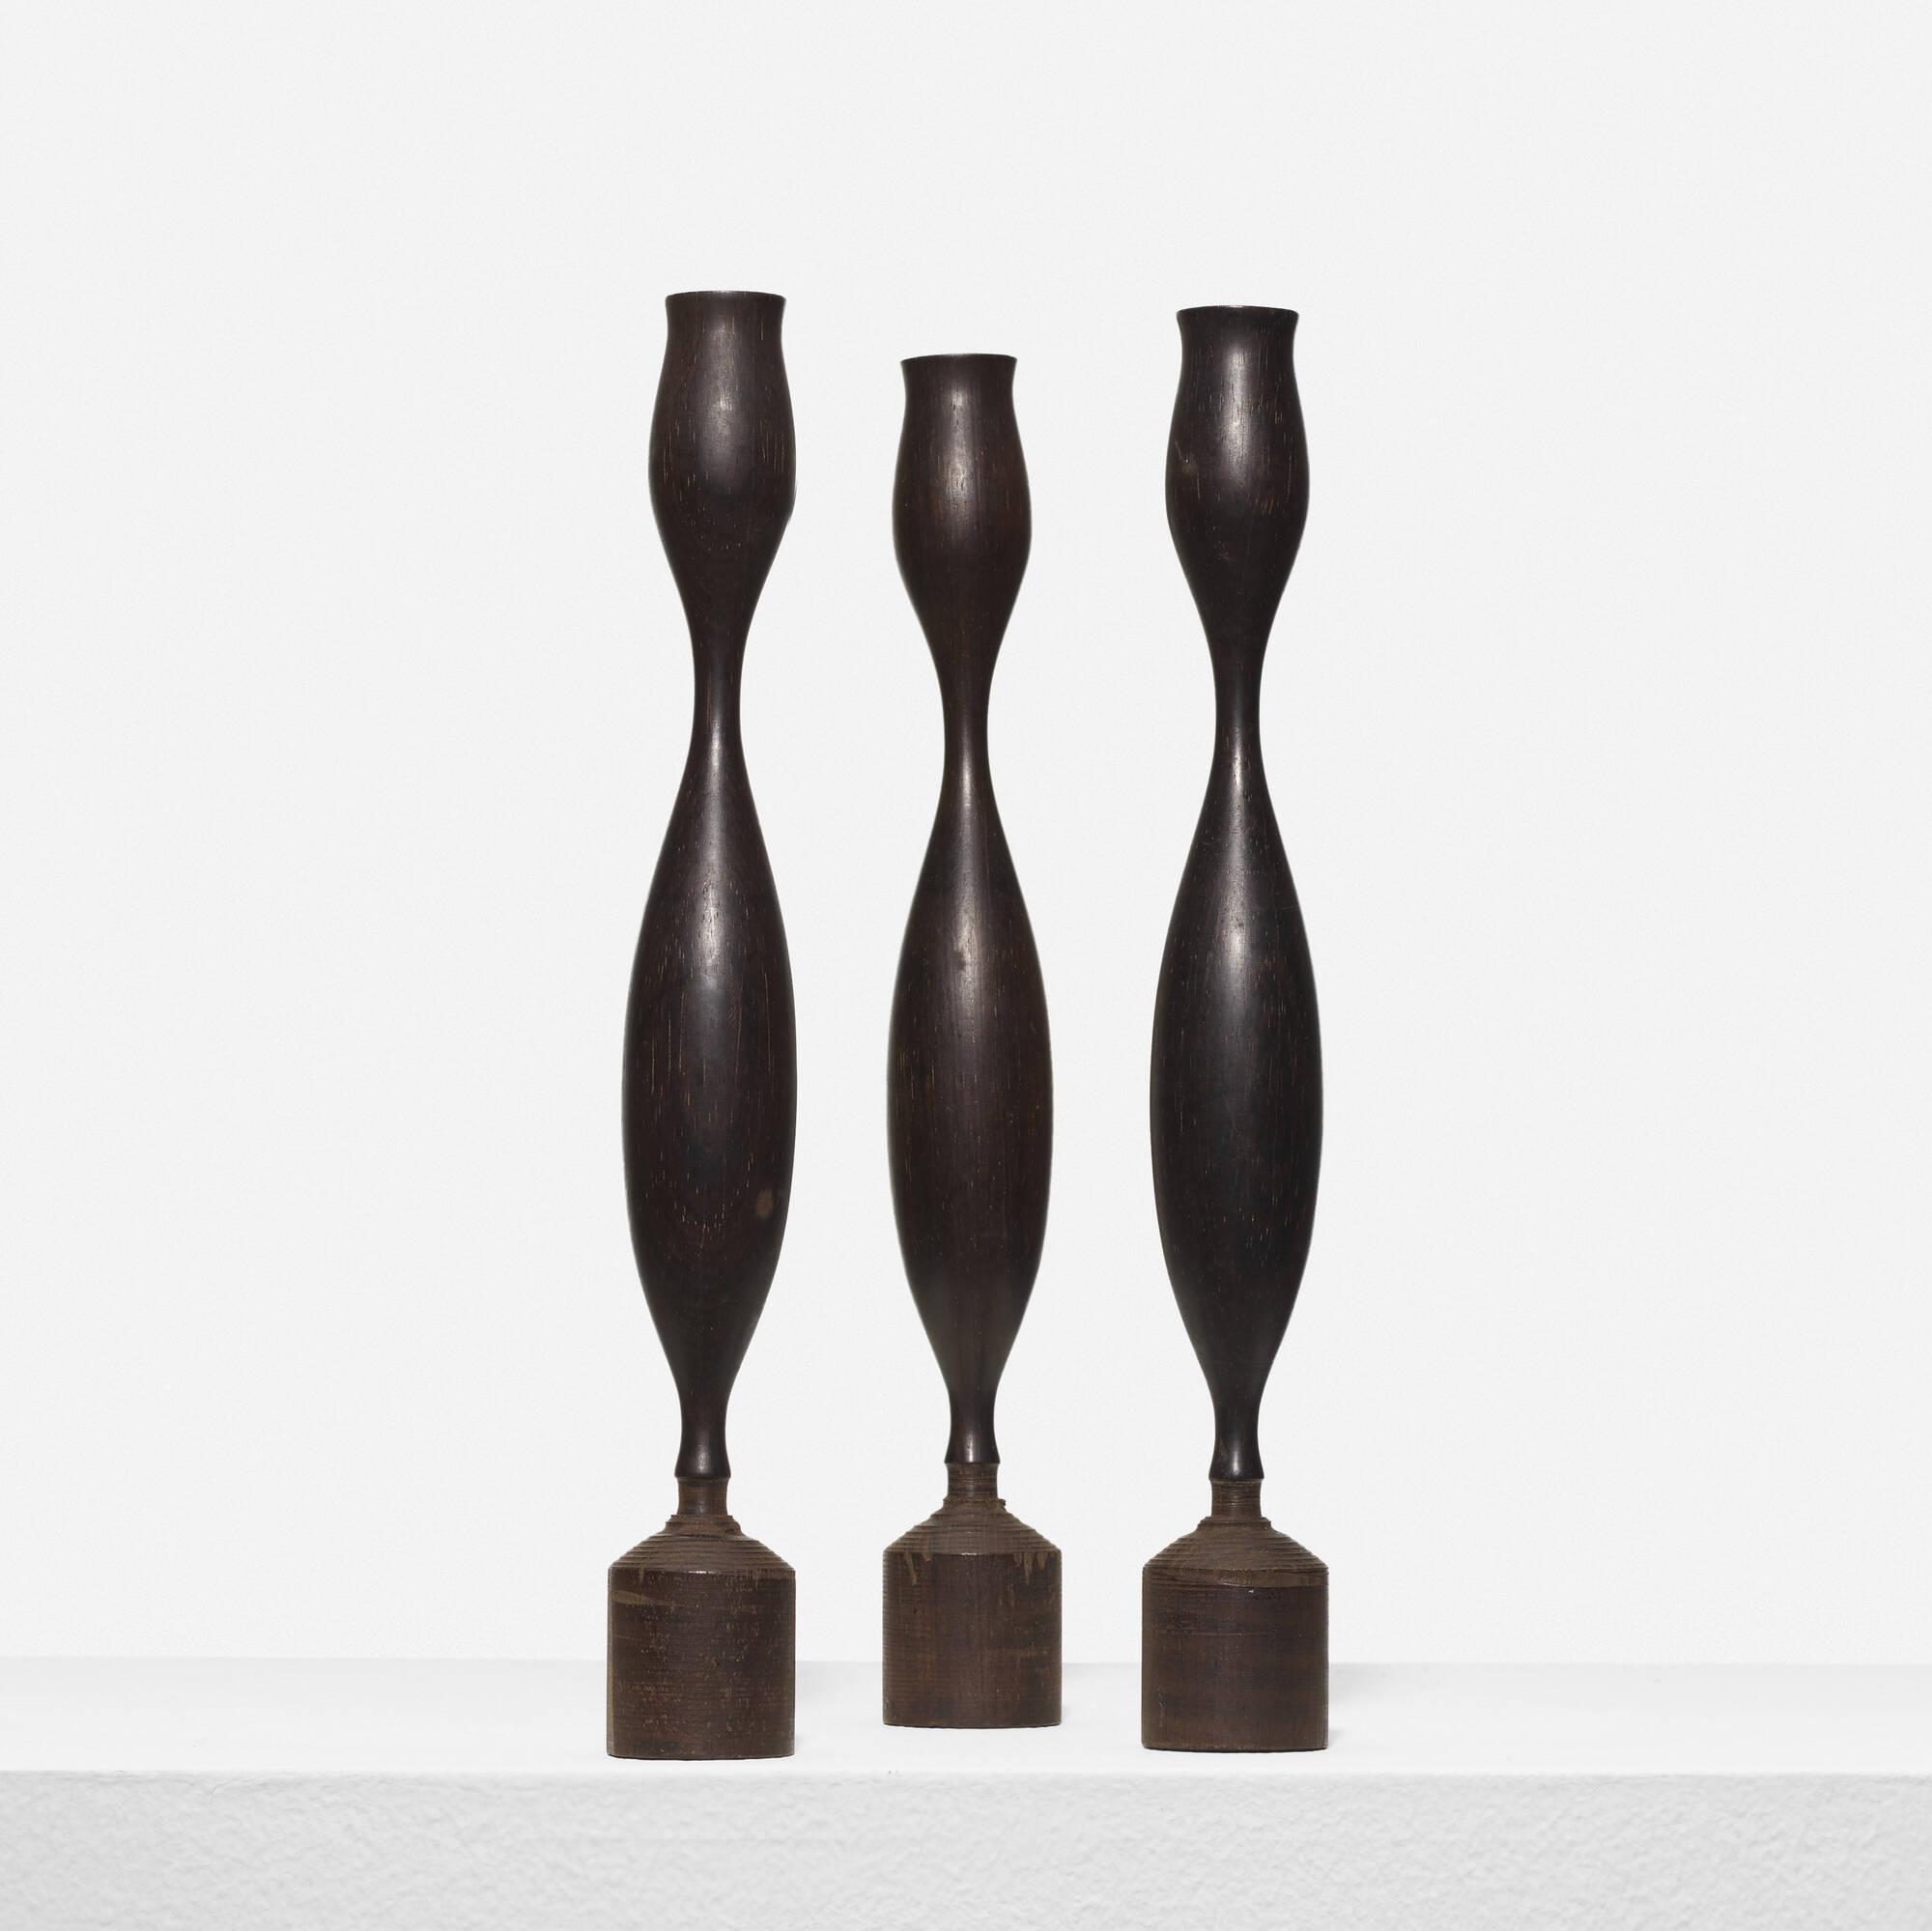 338: Eva Zeisel / prototype candlesticks, set of three (1 of 1)